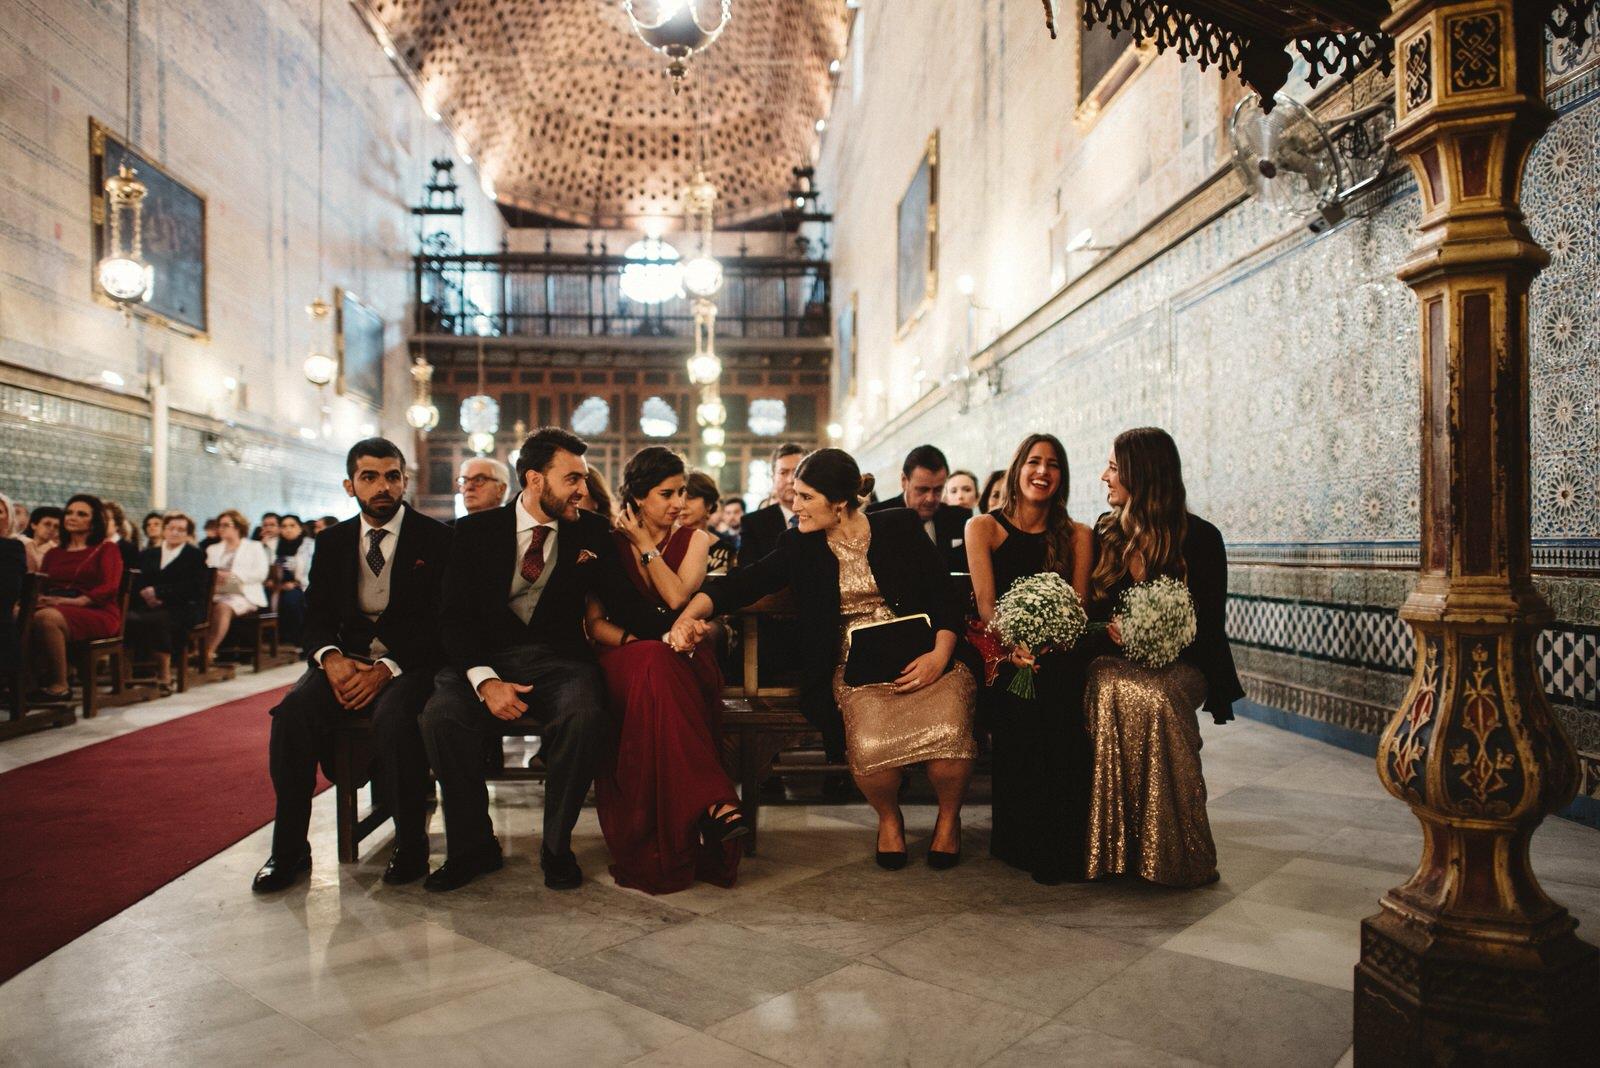 fotografo de bodas sevilla - fotografo boda - fotografía sevilla - Andrés AmarilloAAA_2990- fine.JPG